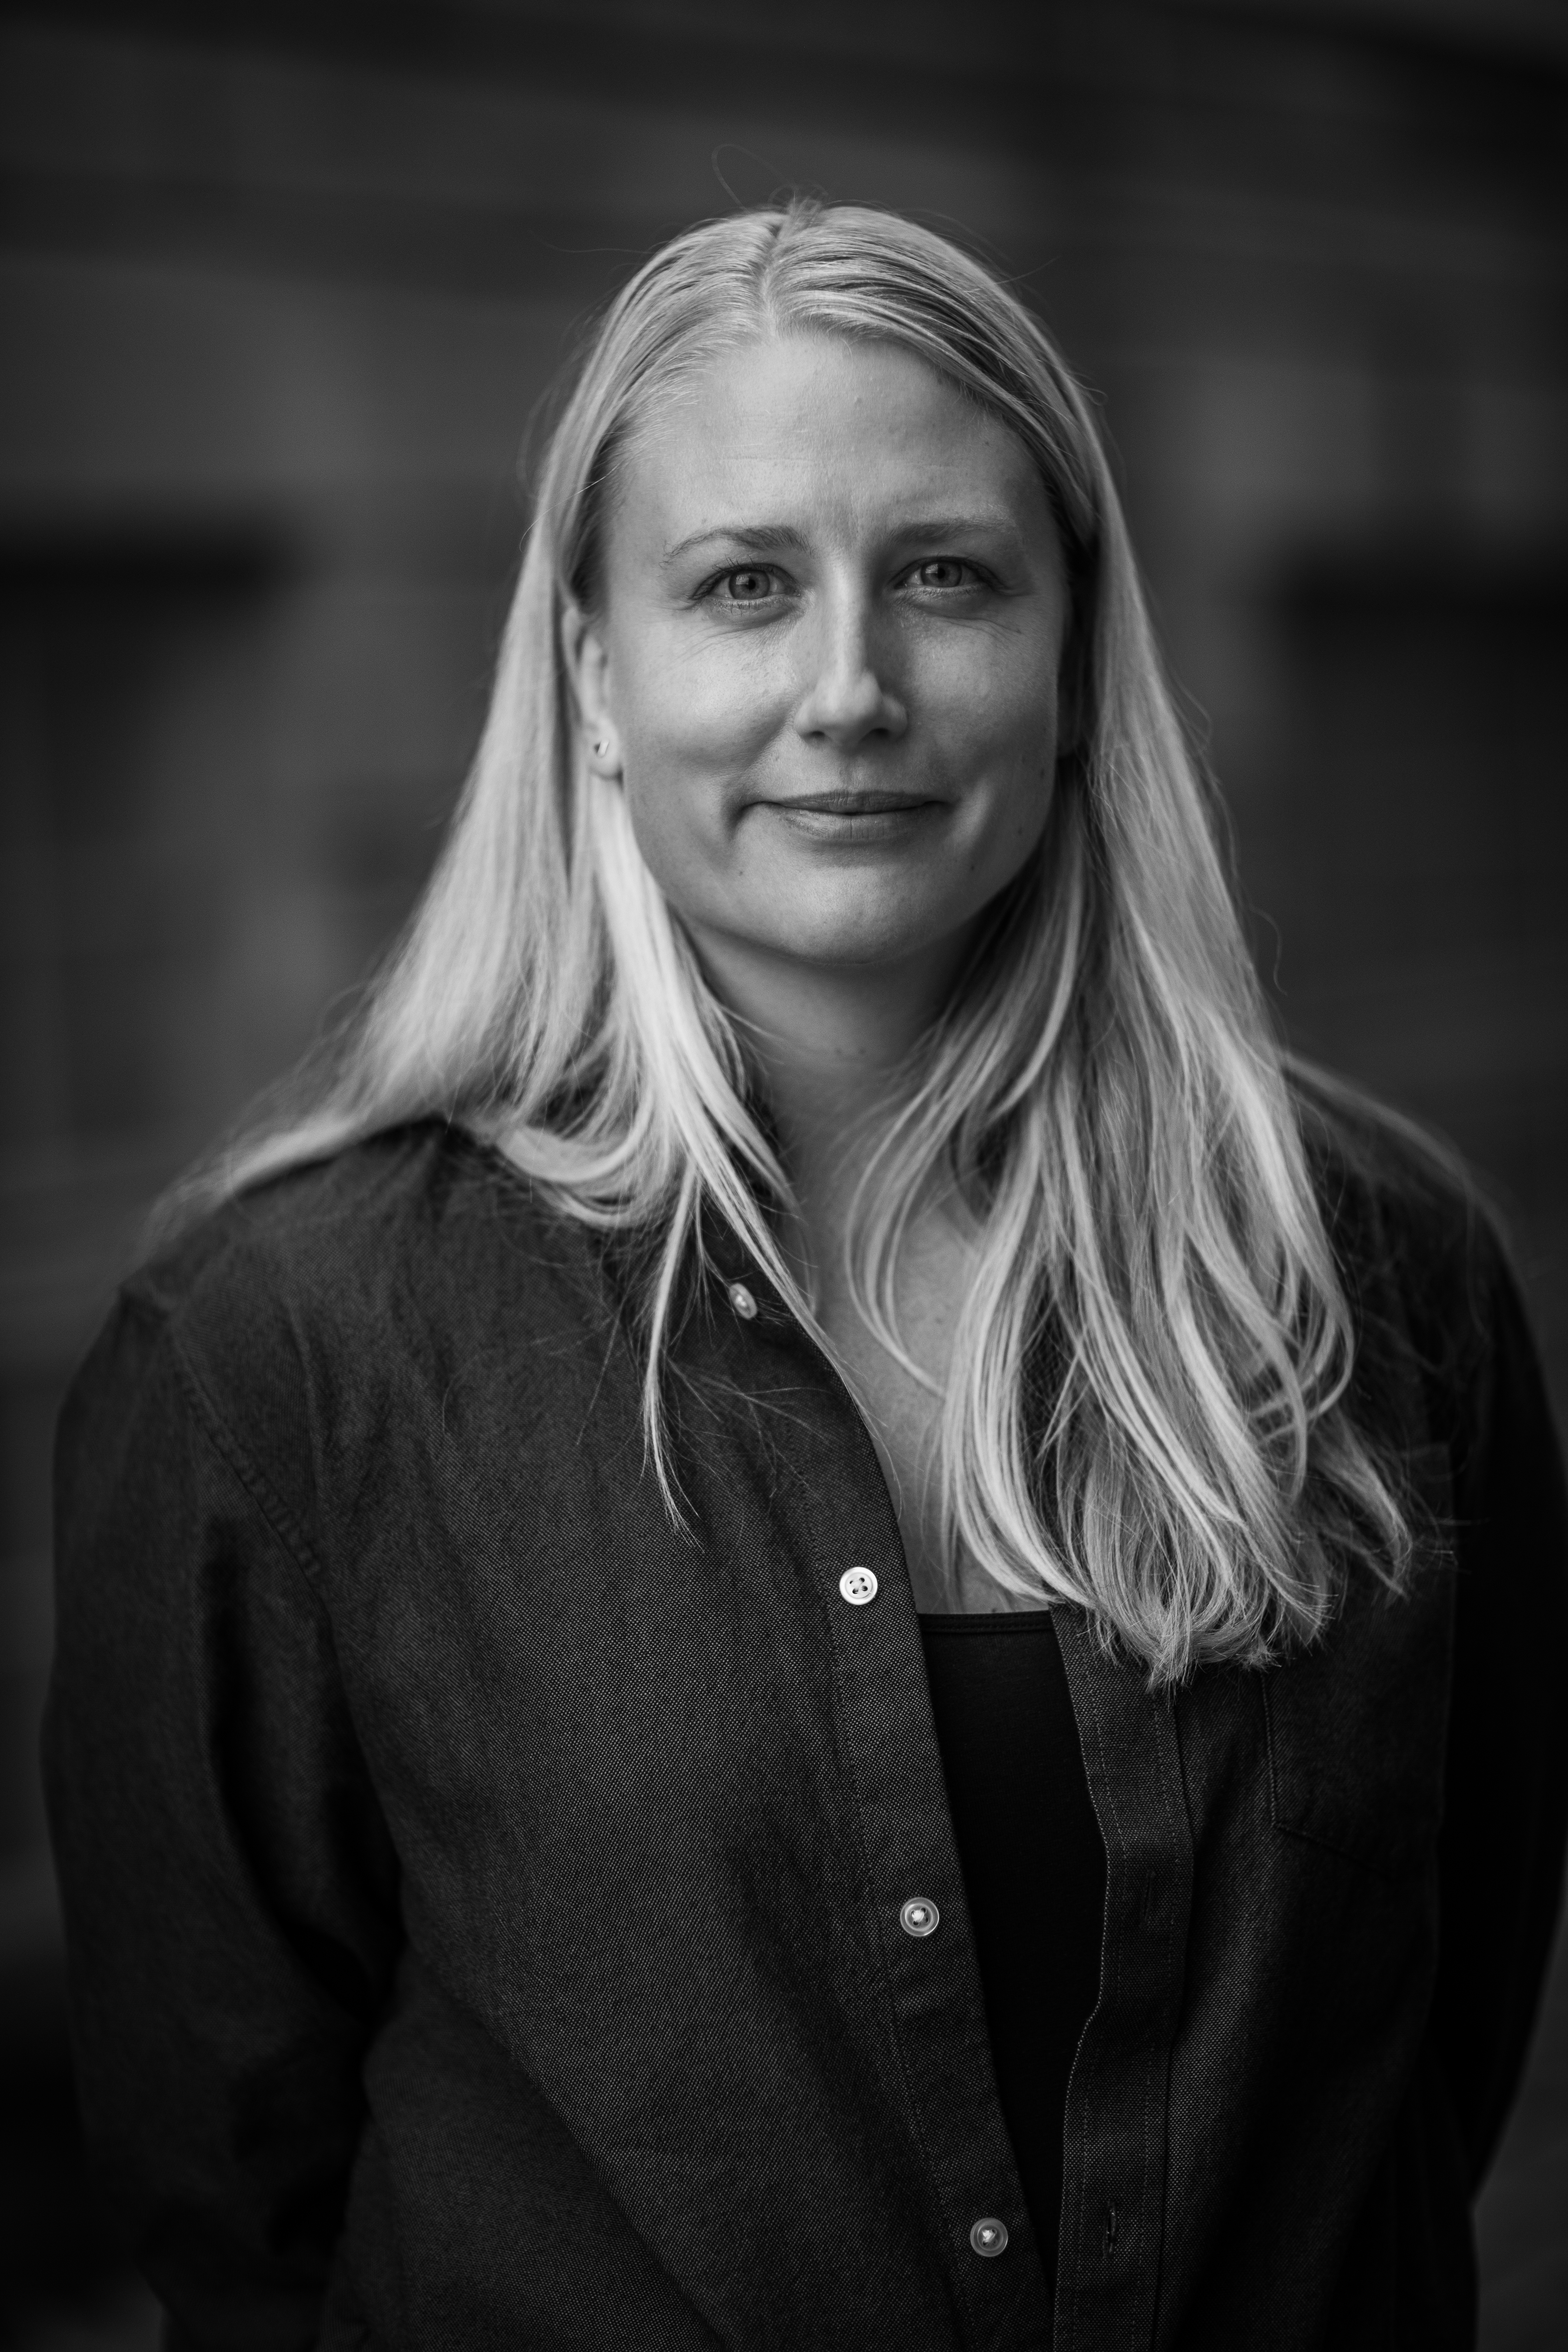 Eva Åkergren